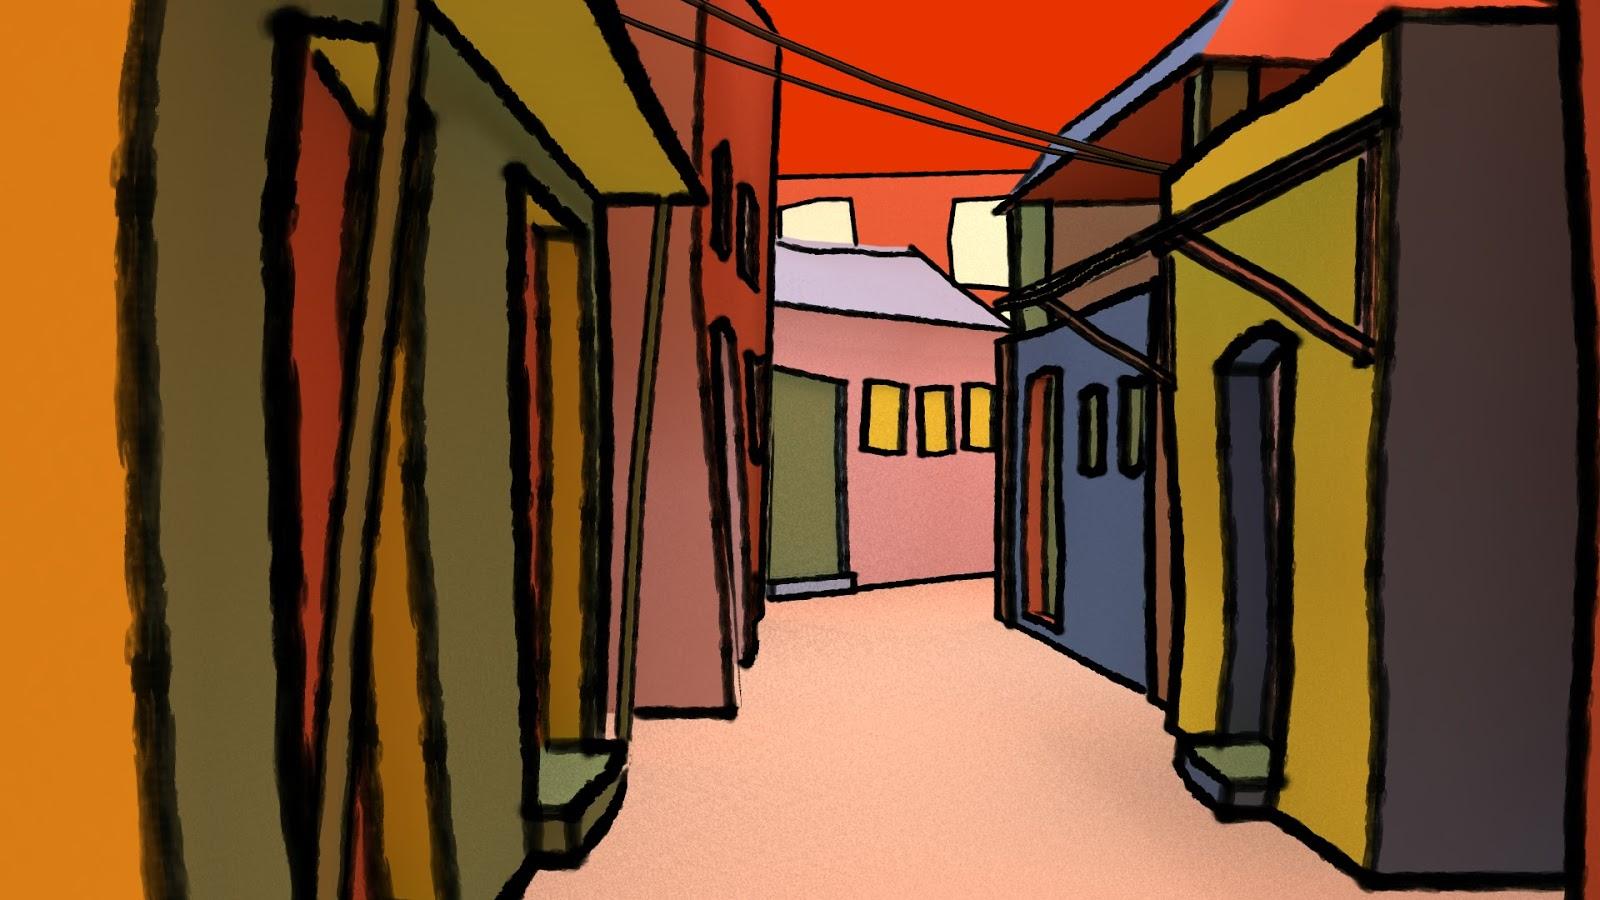 Alleyway_Modelling_Progress_FullColour_WithOutline.jpg